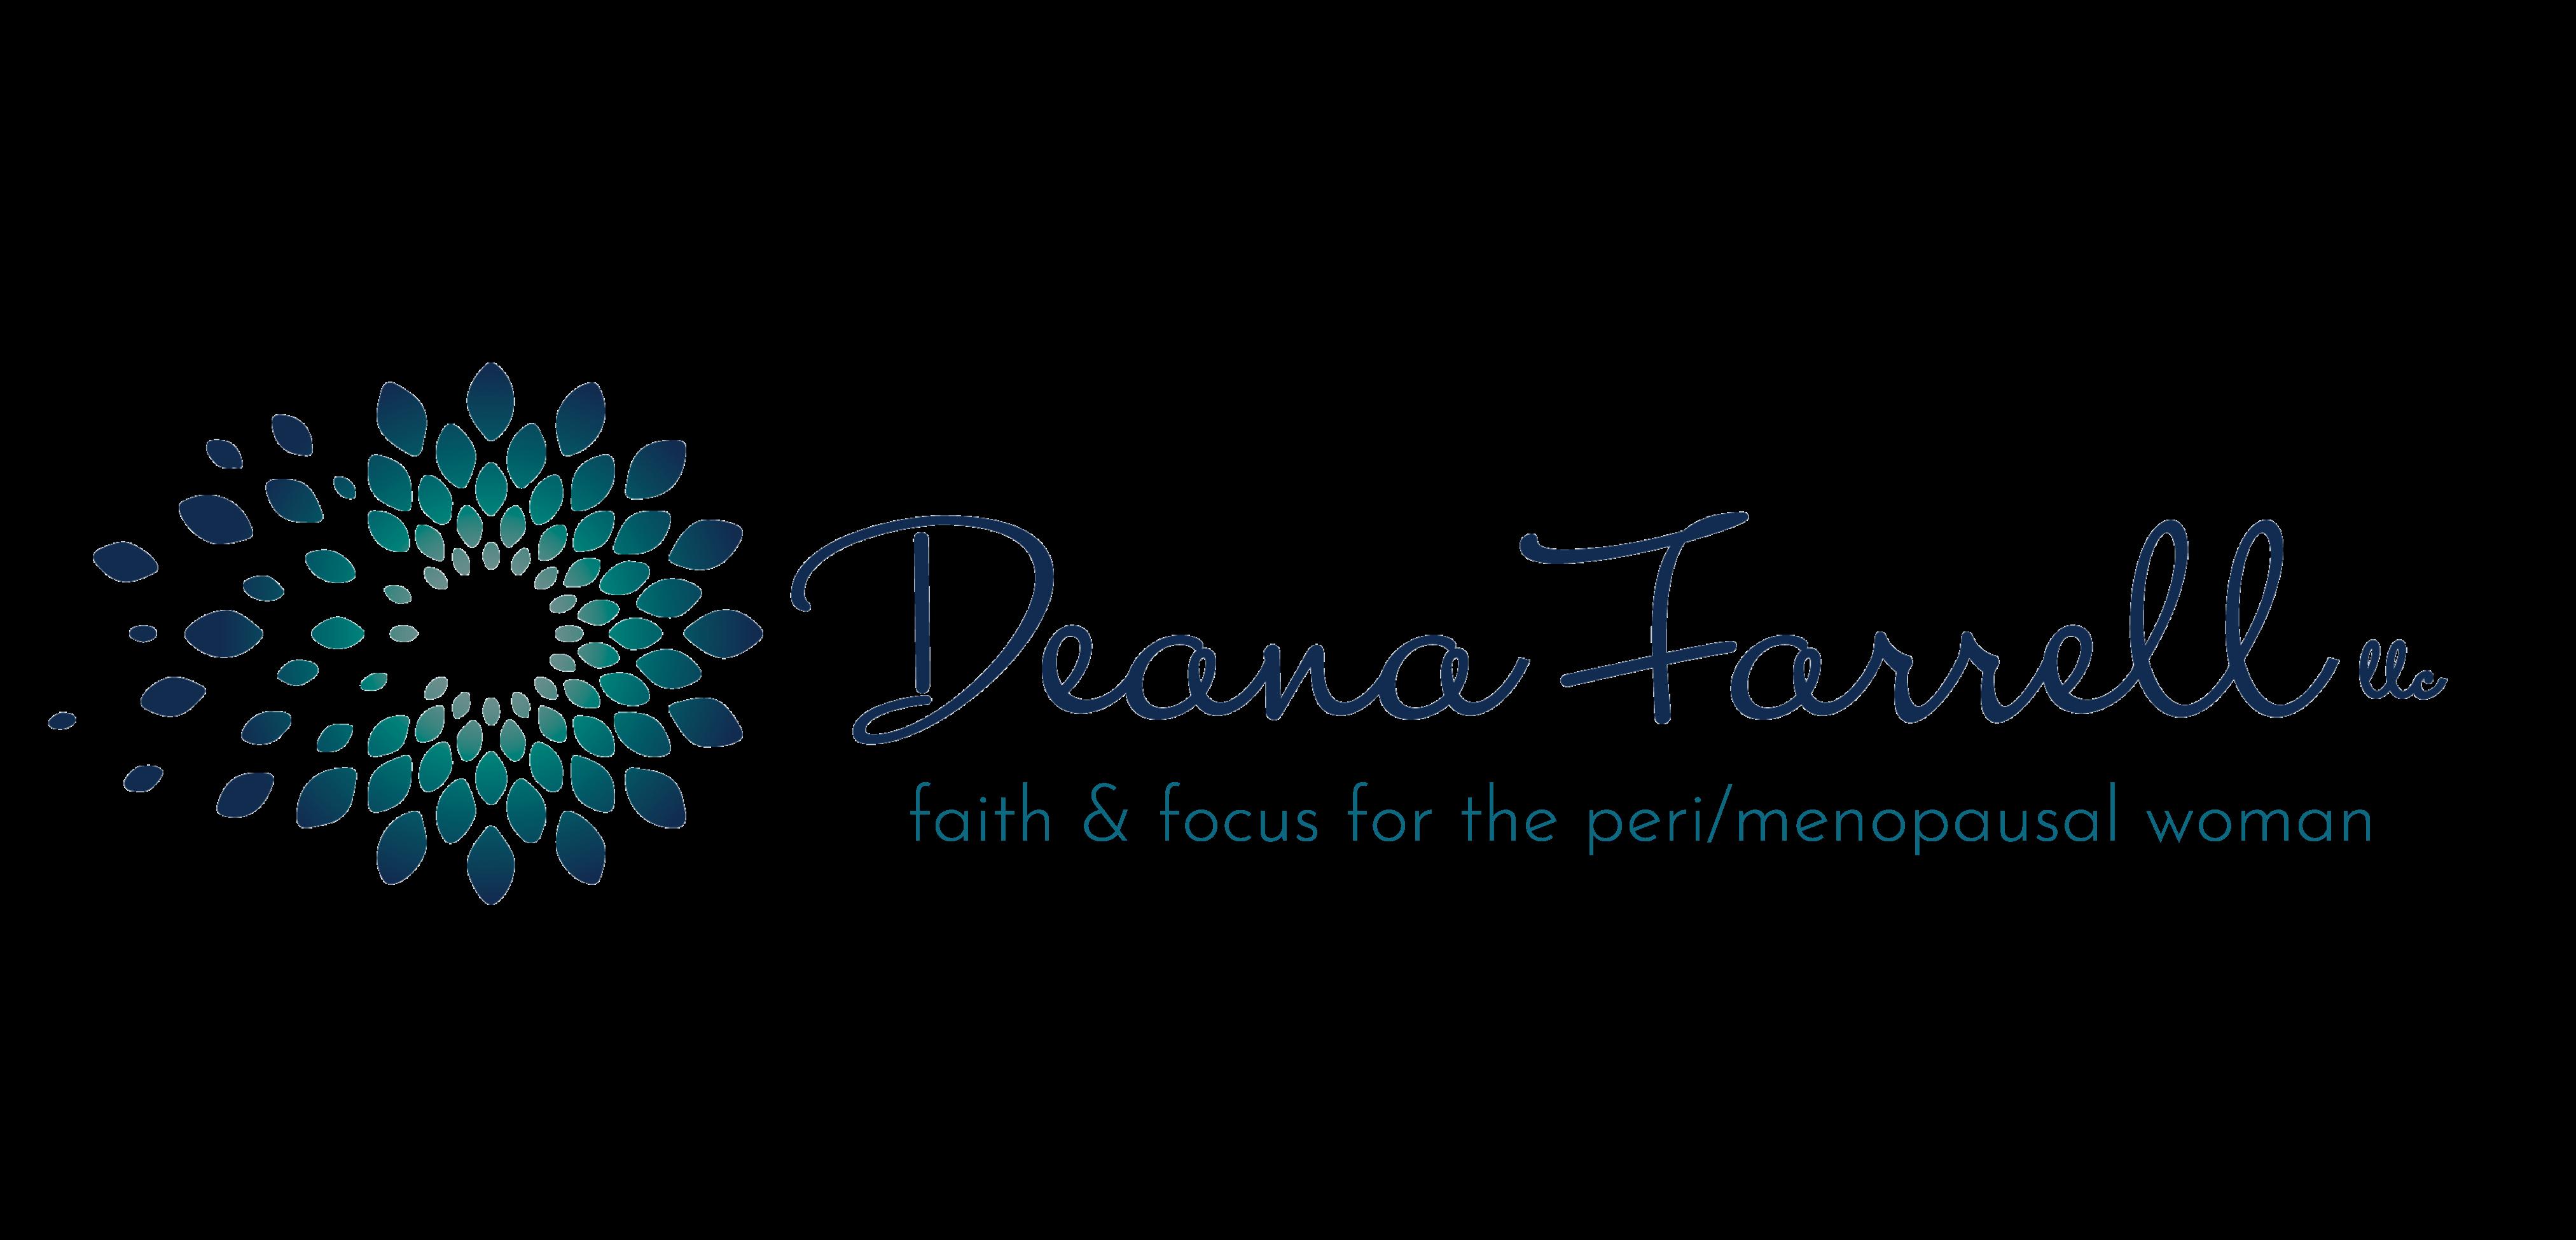 Deana Farrell Coaching